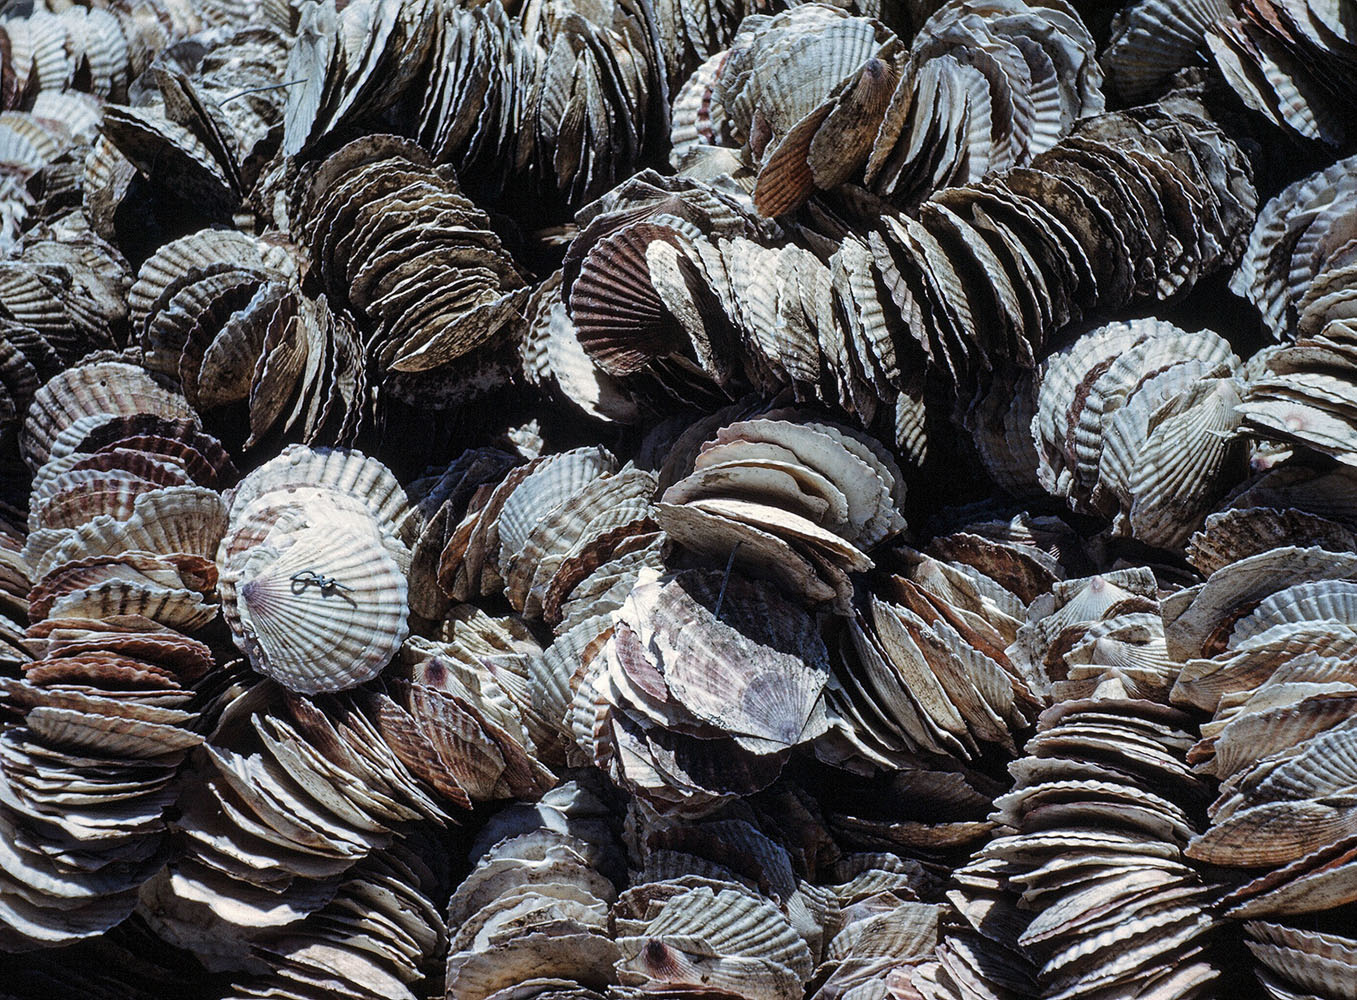 137- Strings of Shells